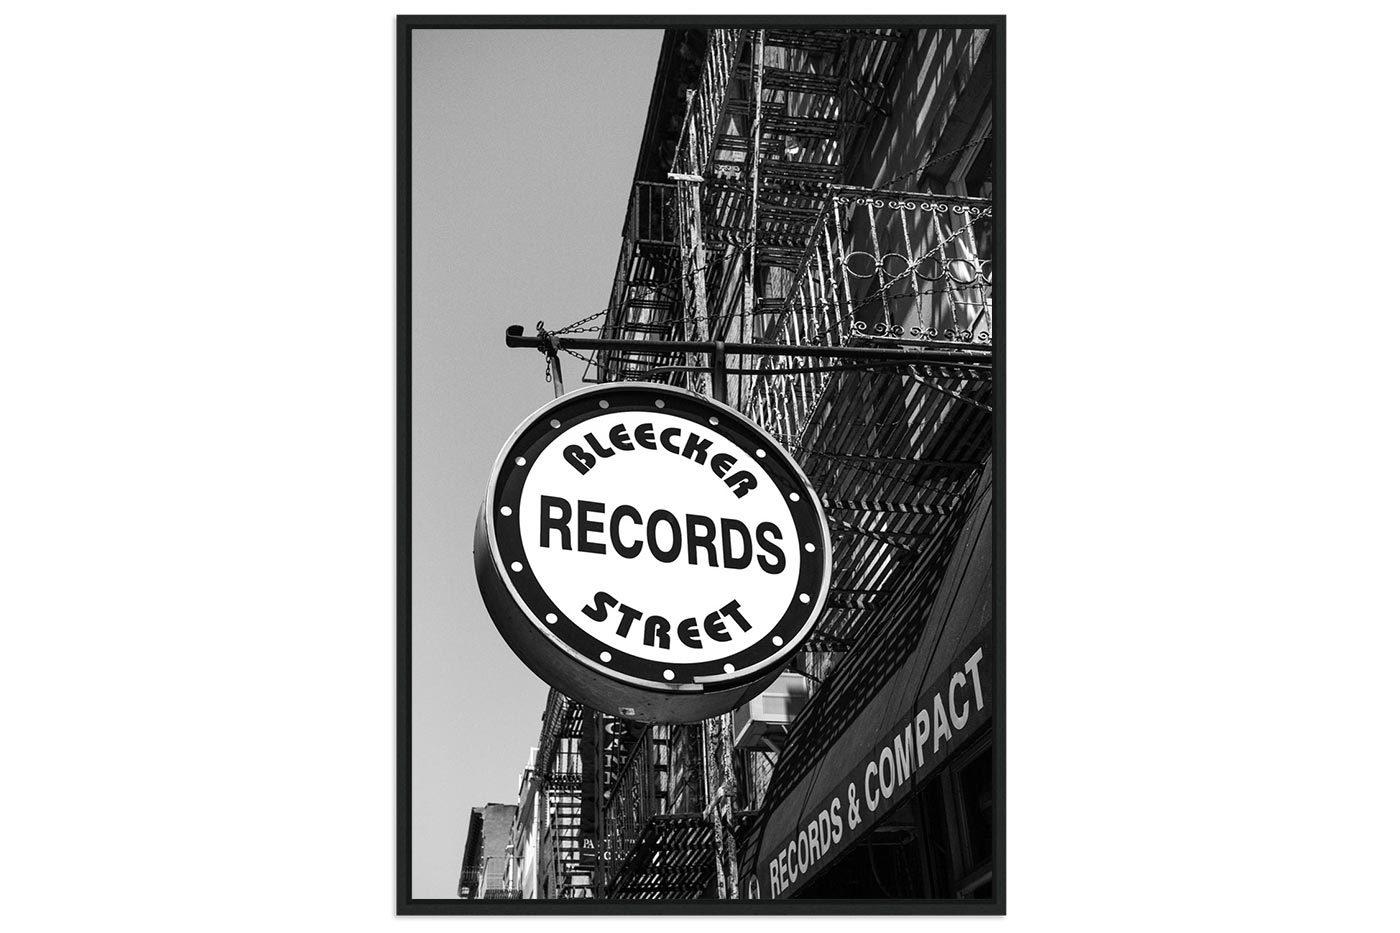 Caisse americaine Bleecker Records